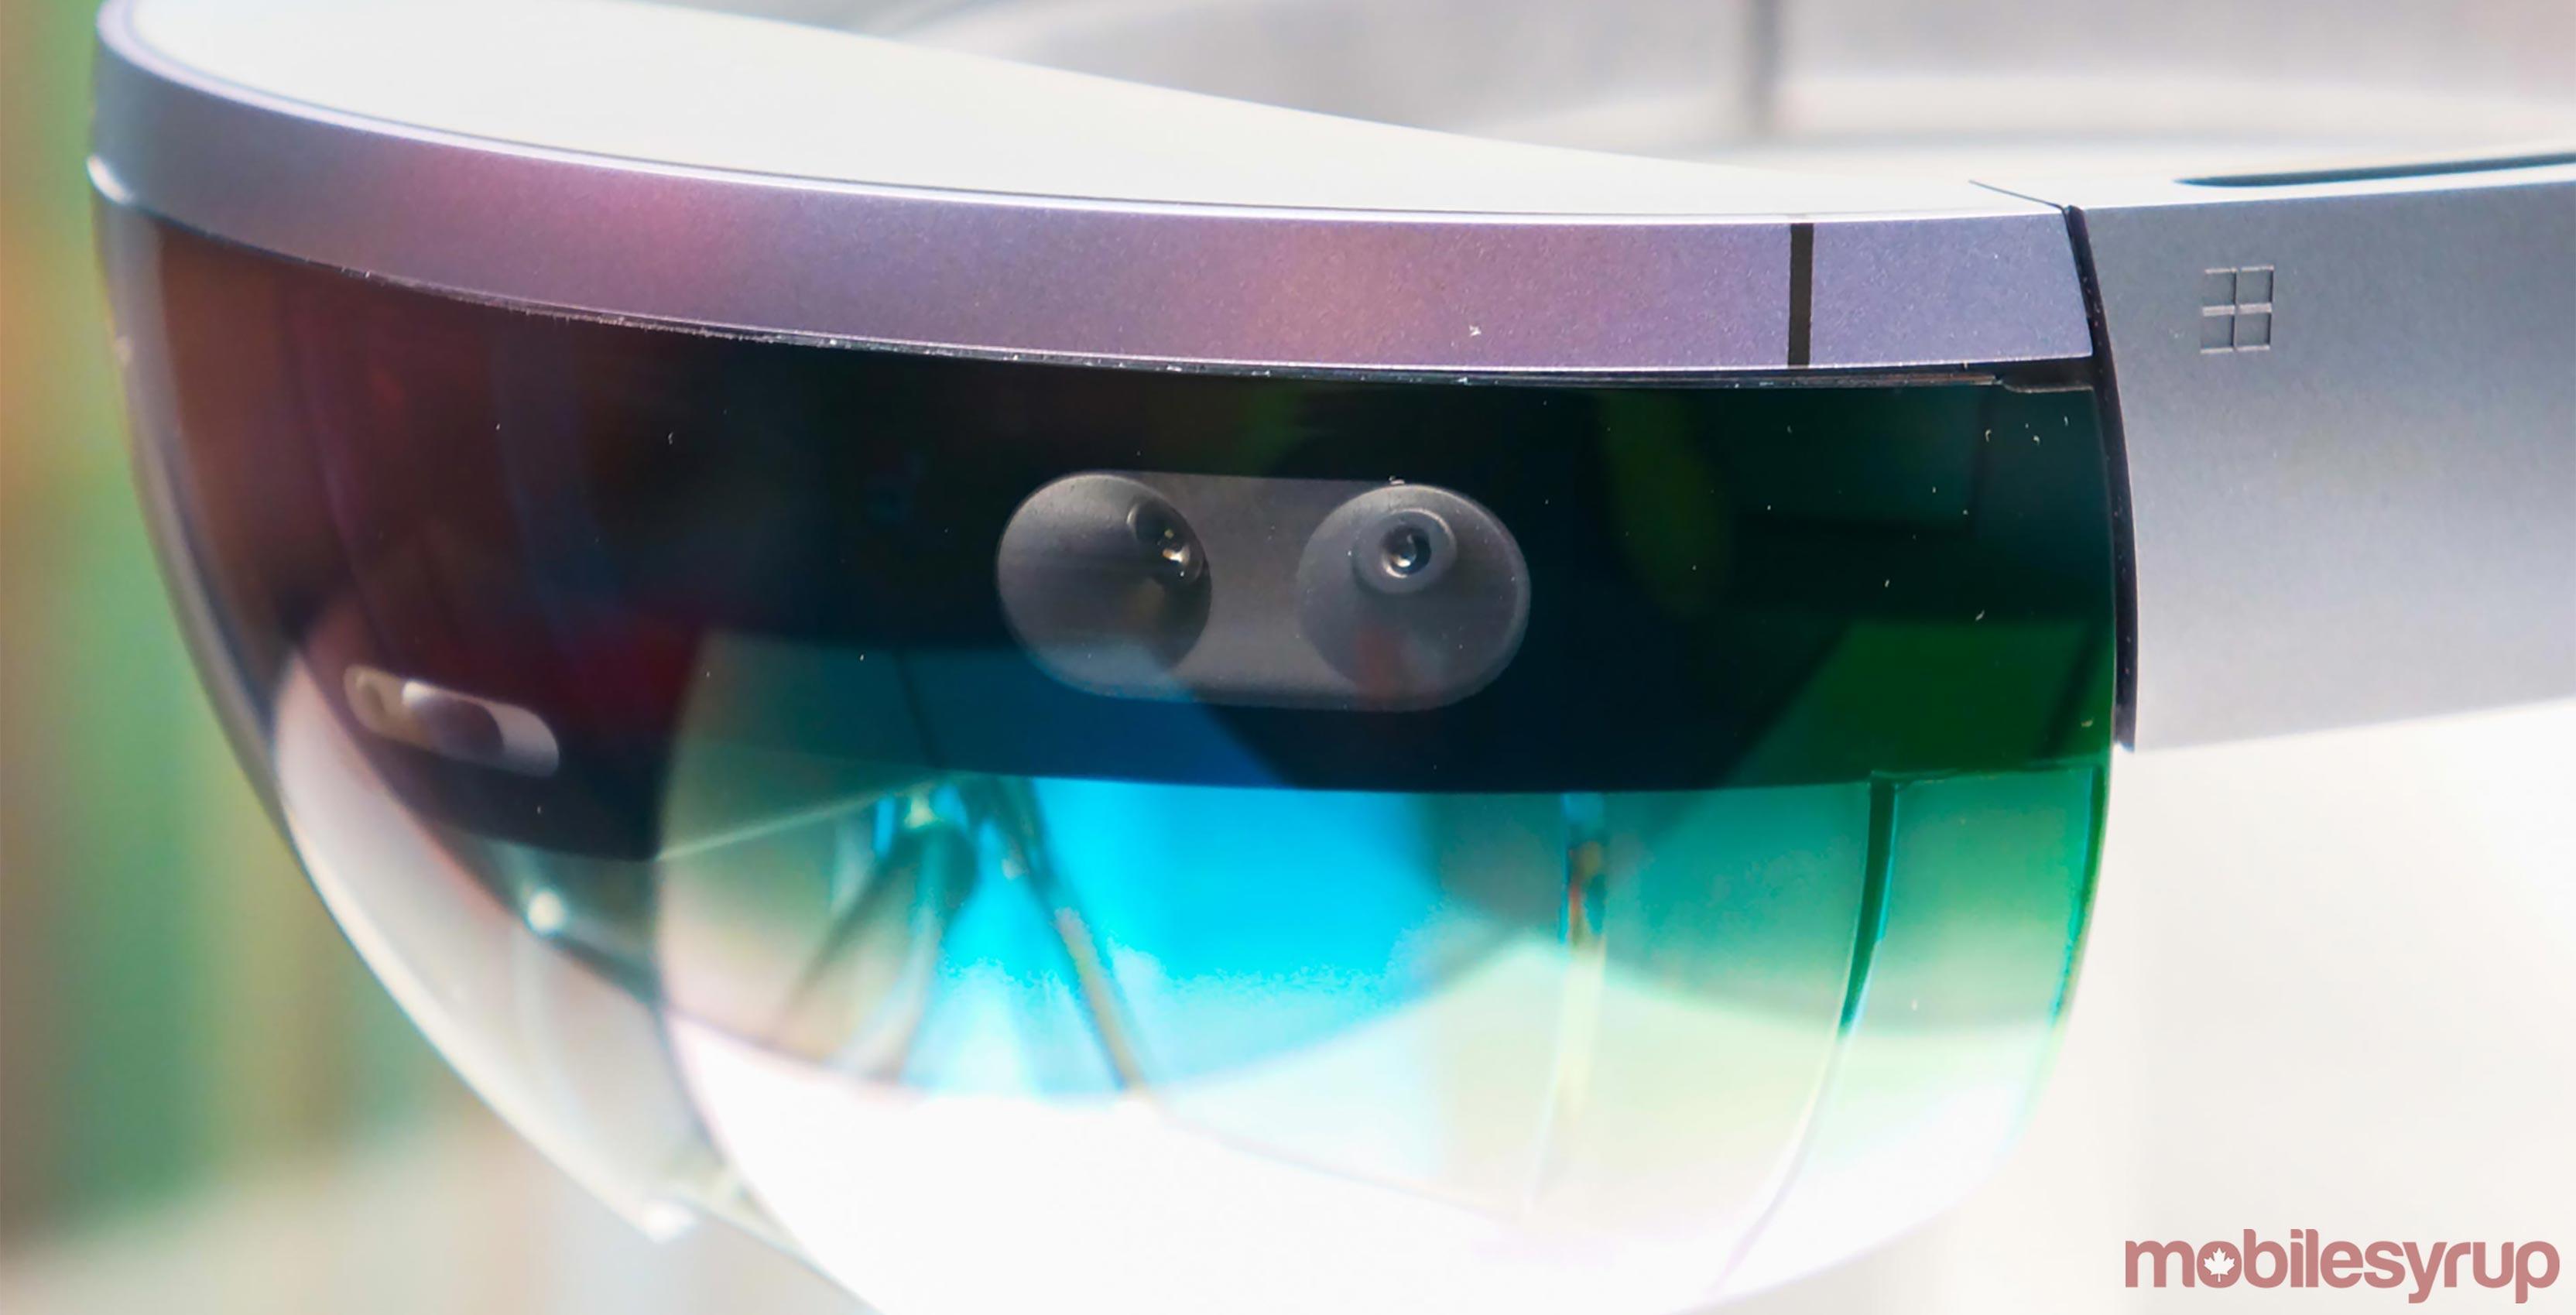 Photo of Microsoft s HoloLens AR headset 9897dca92f